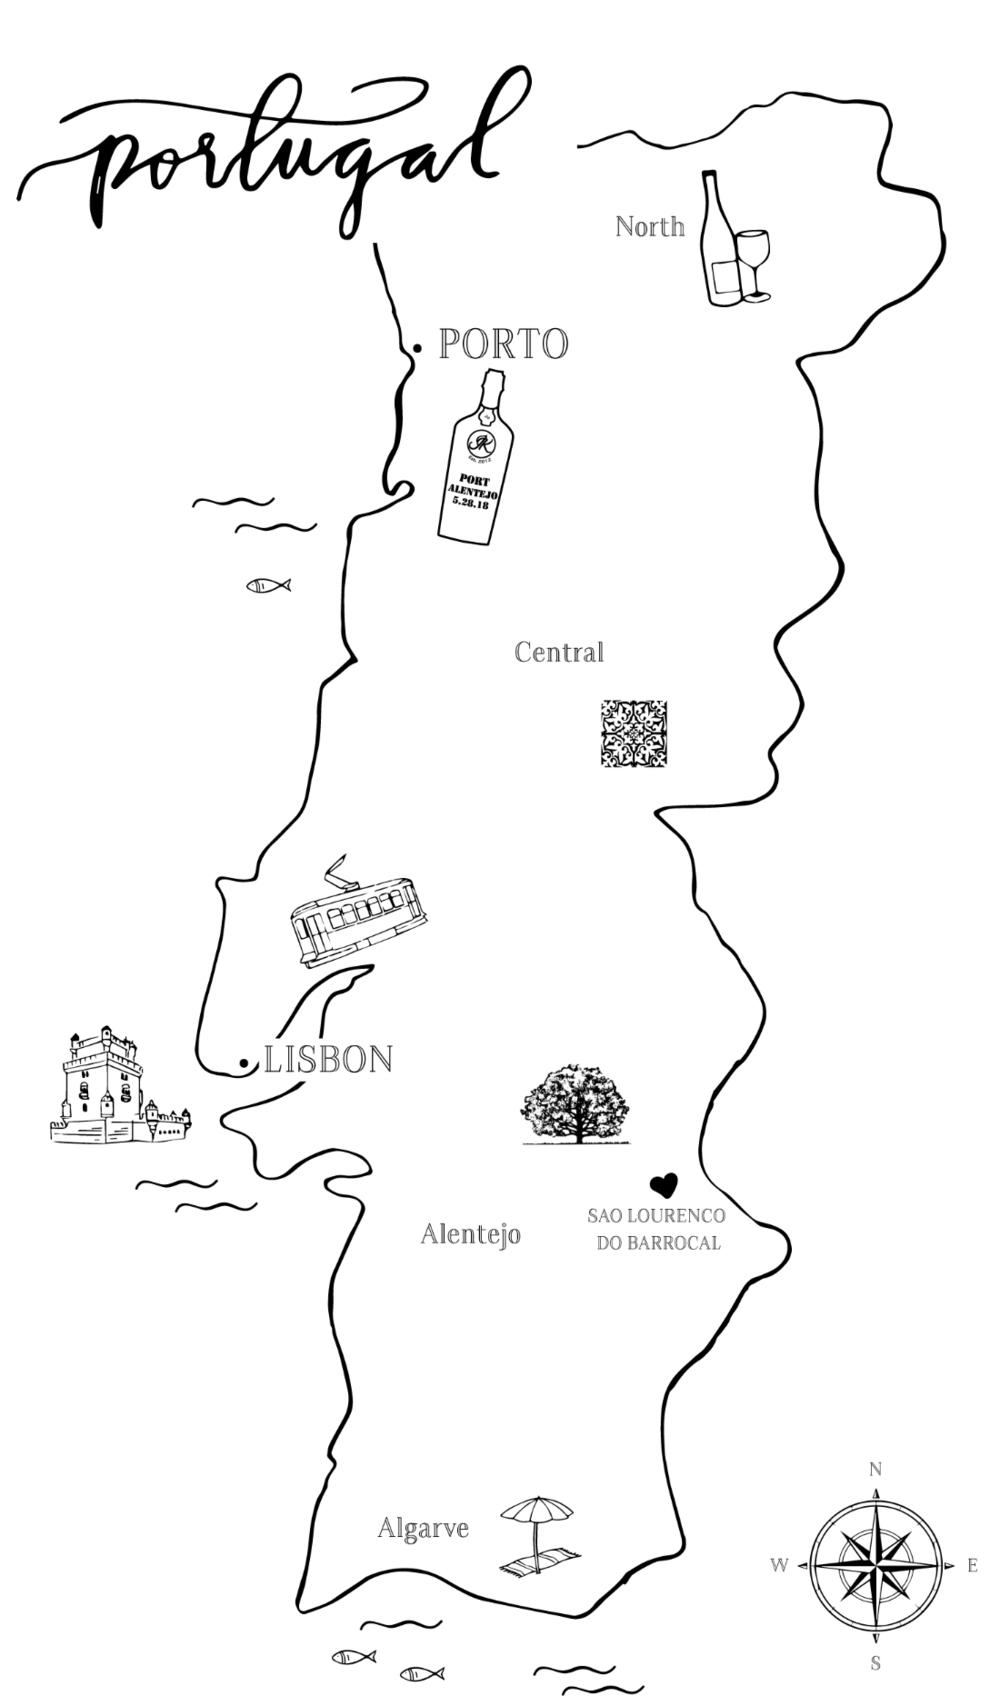 MAP Jonathan Kirsten - Portugal map png